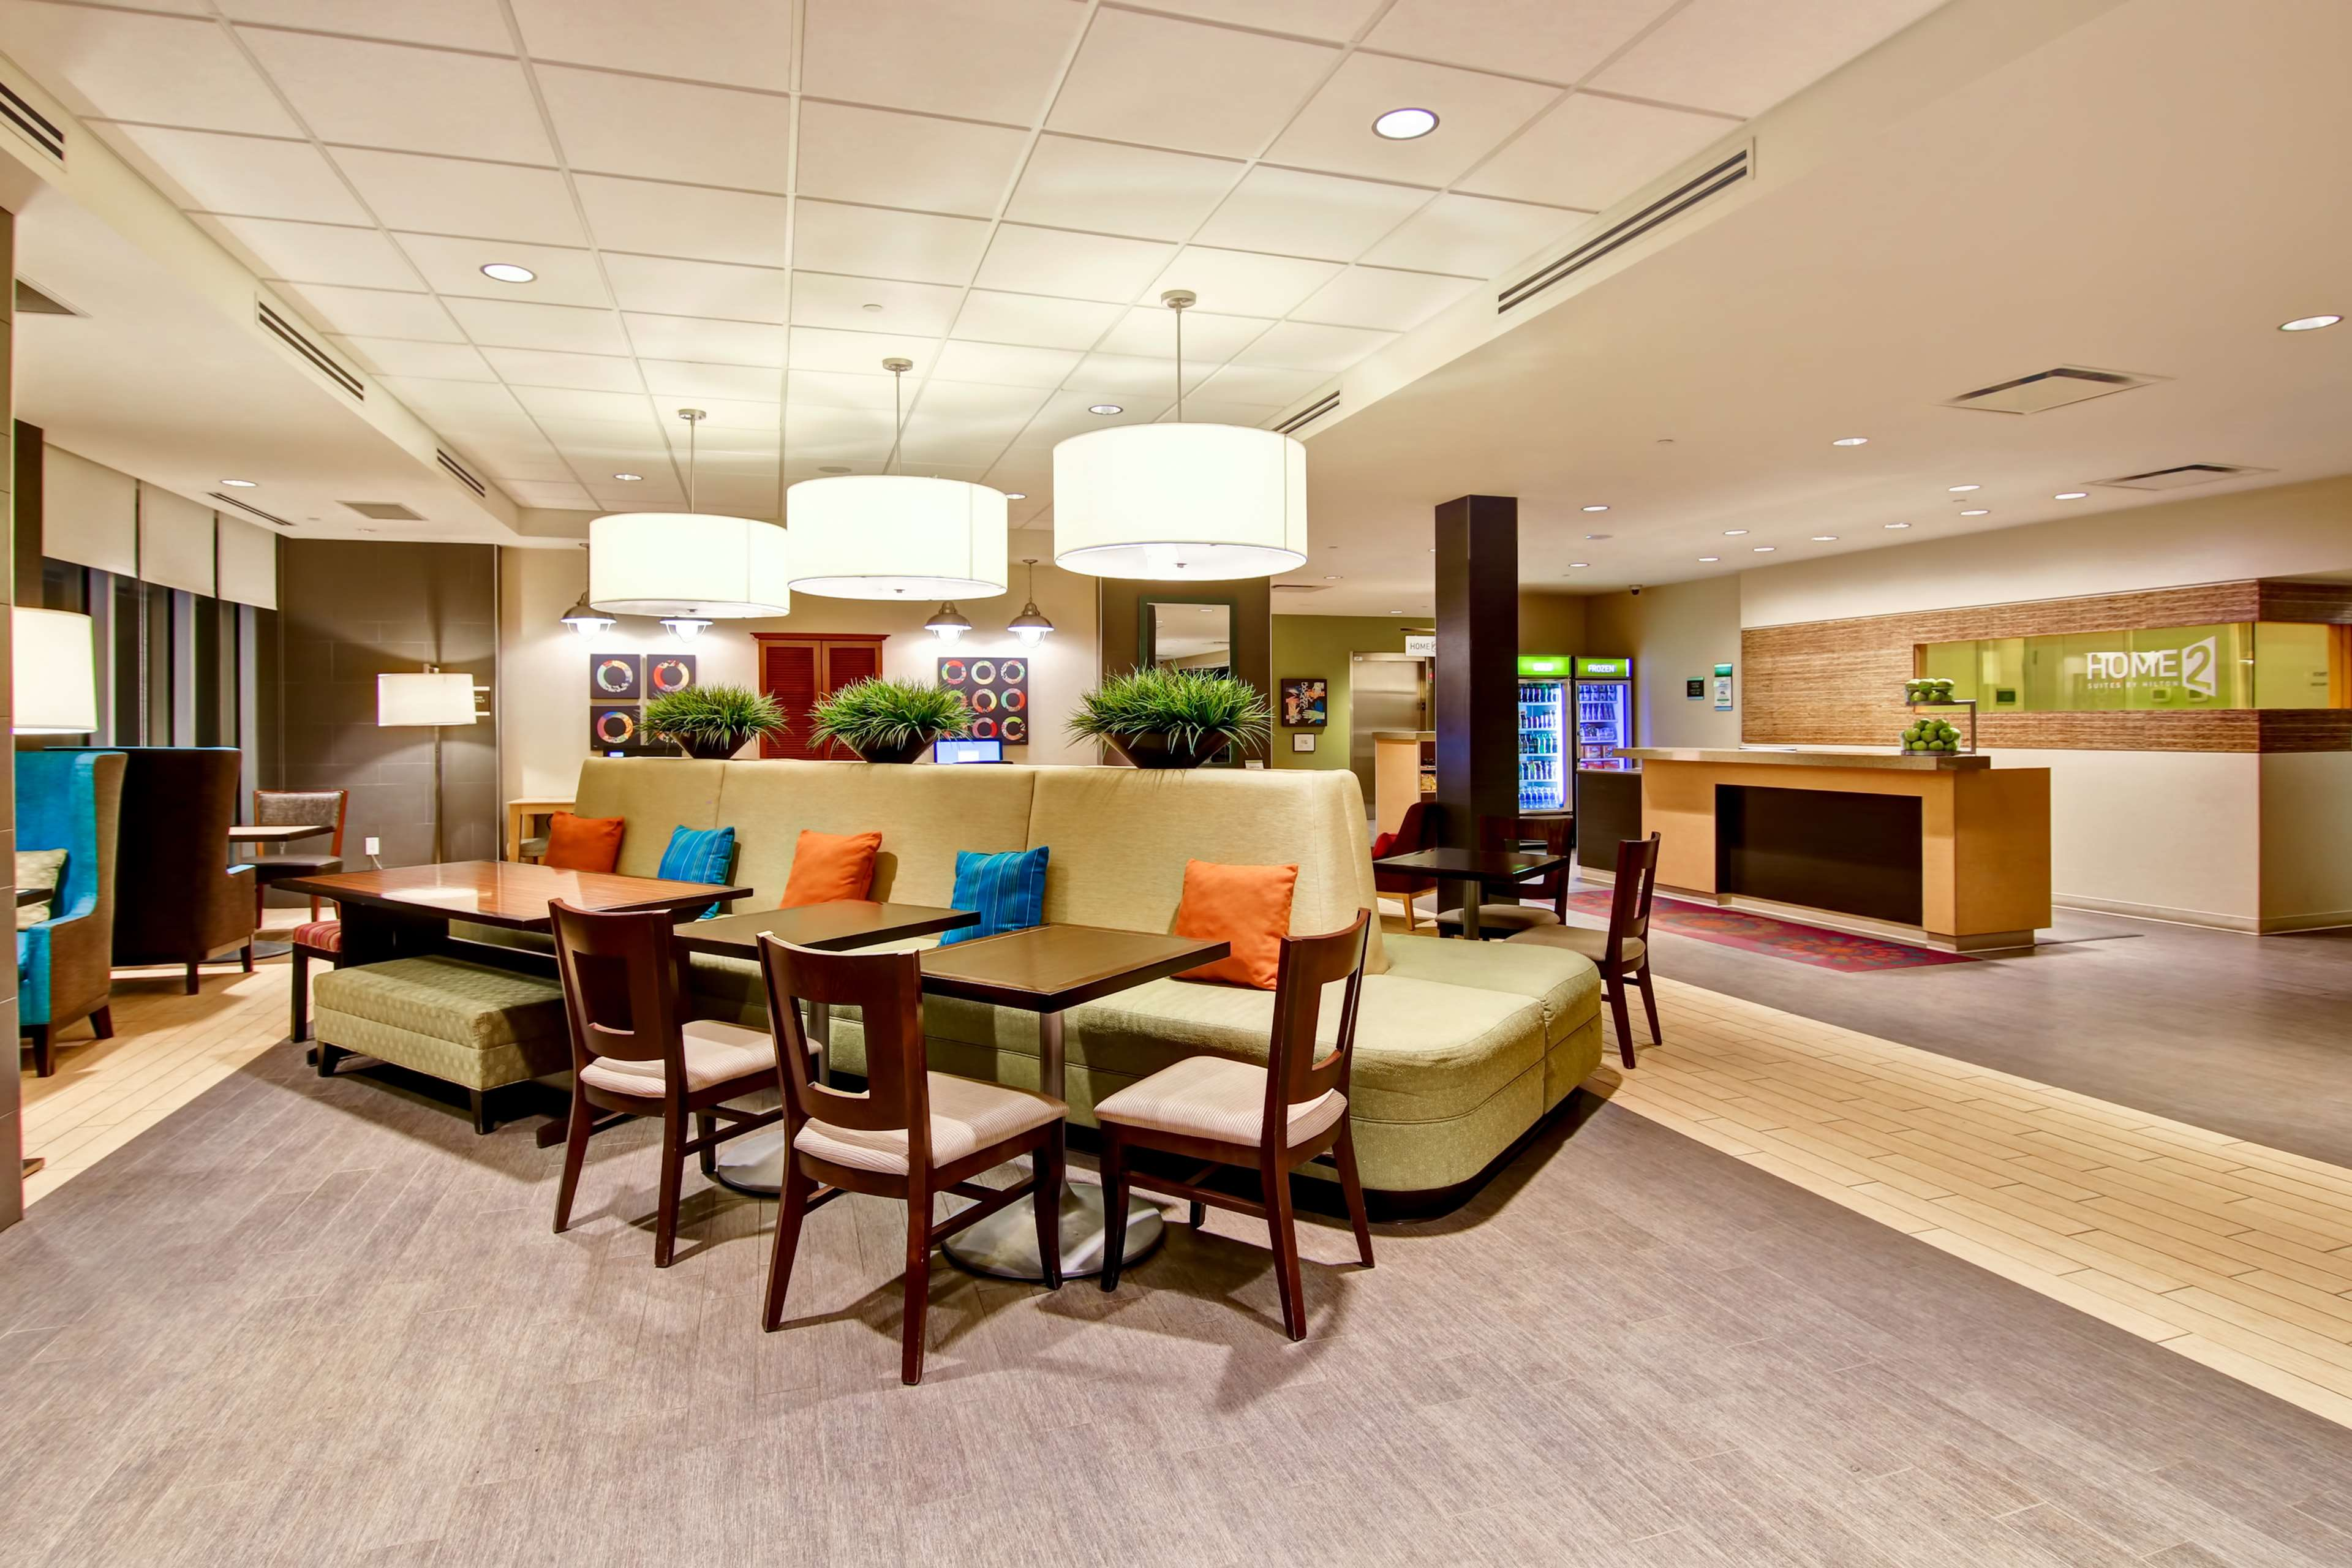 Home2 Suites by Hilton West Edmonton, Alberta, Canada in Edmonton: Lobby